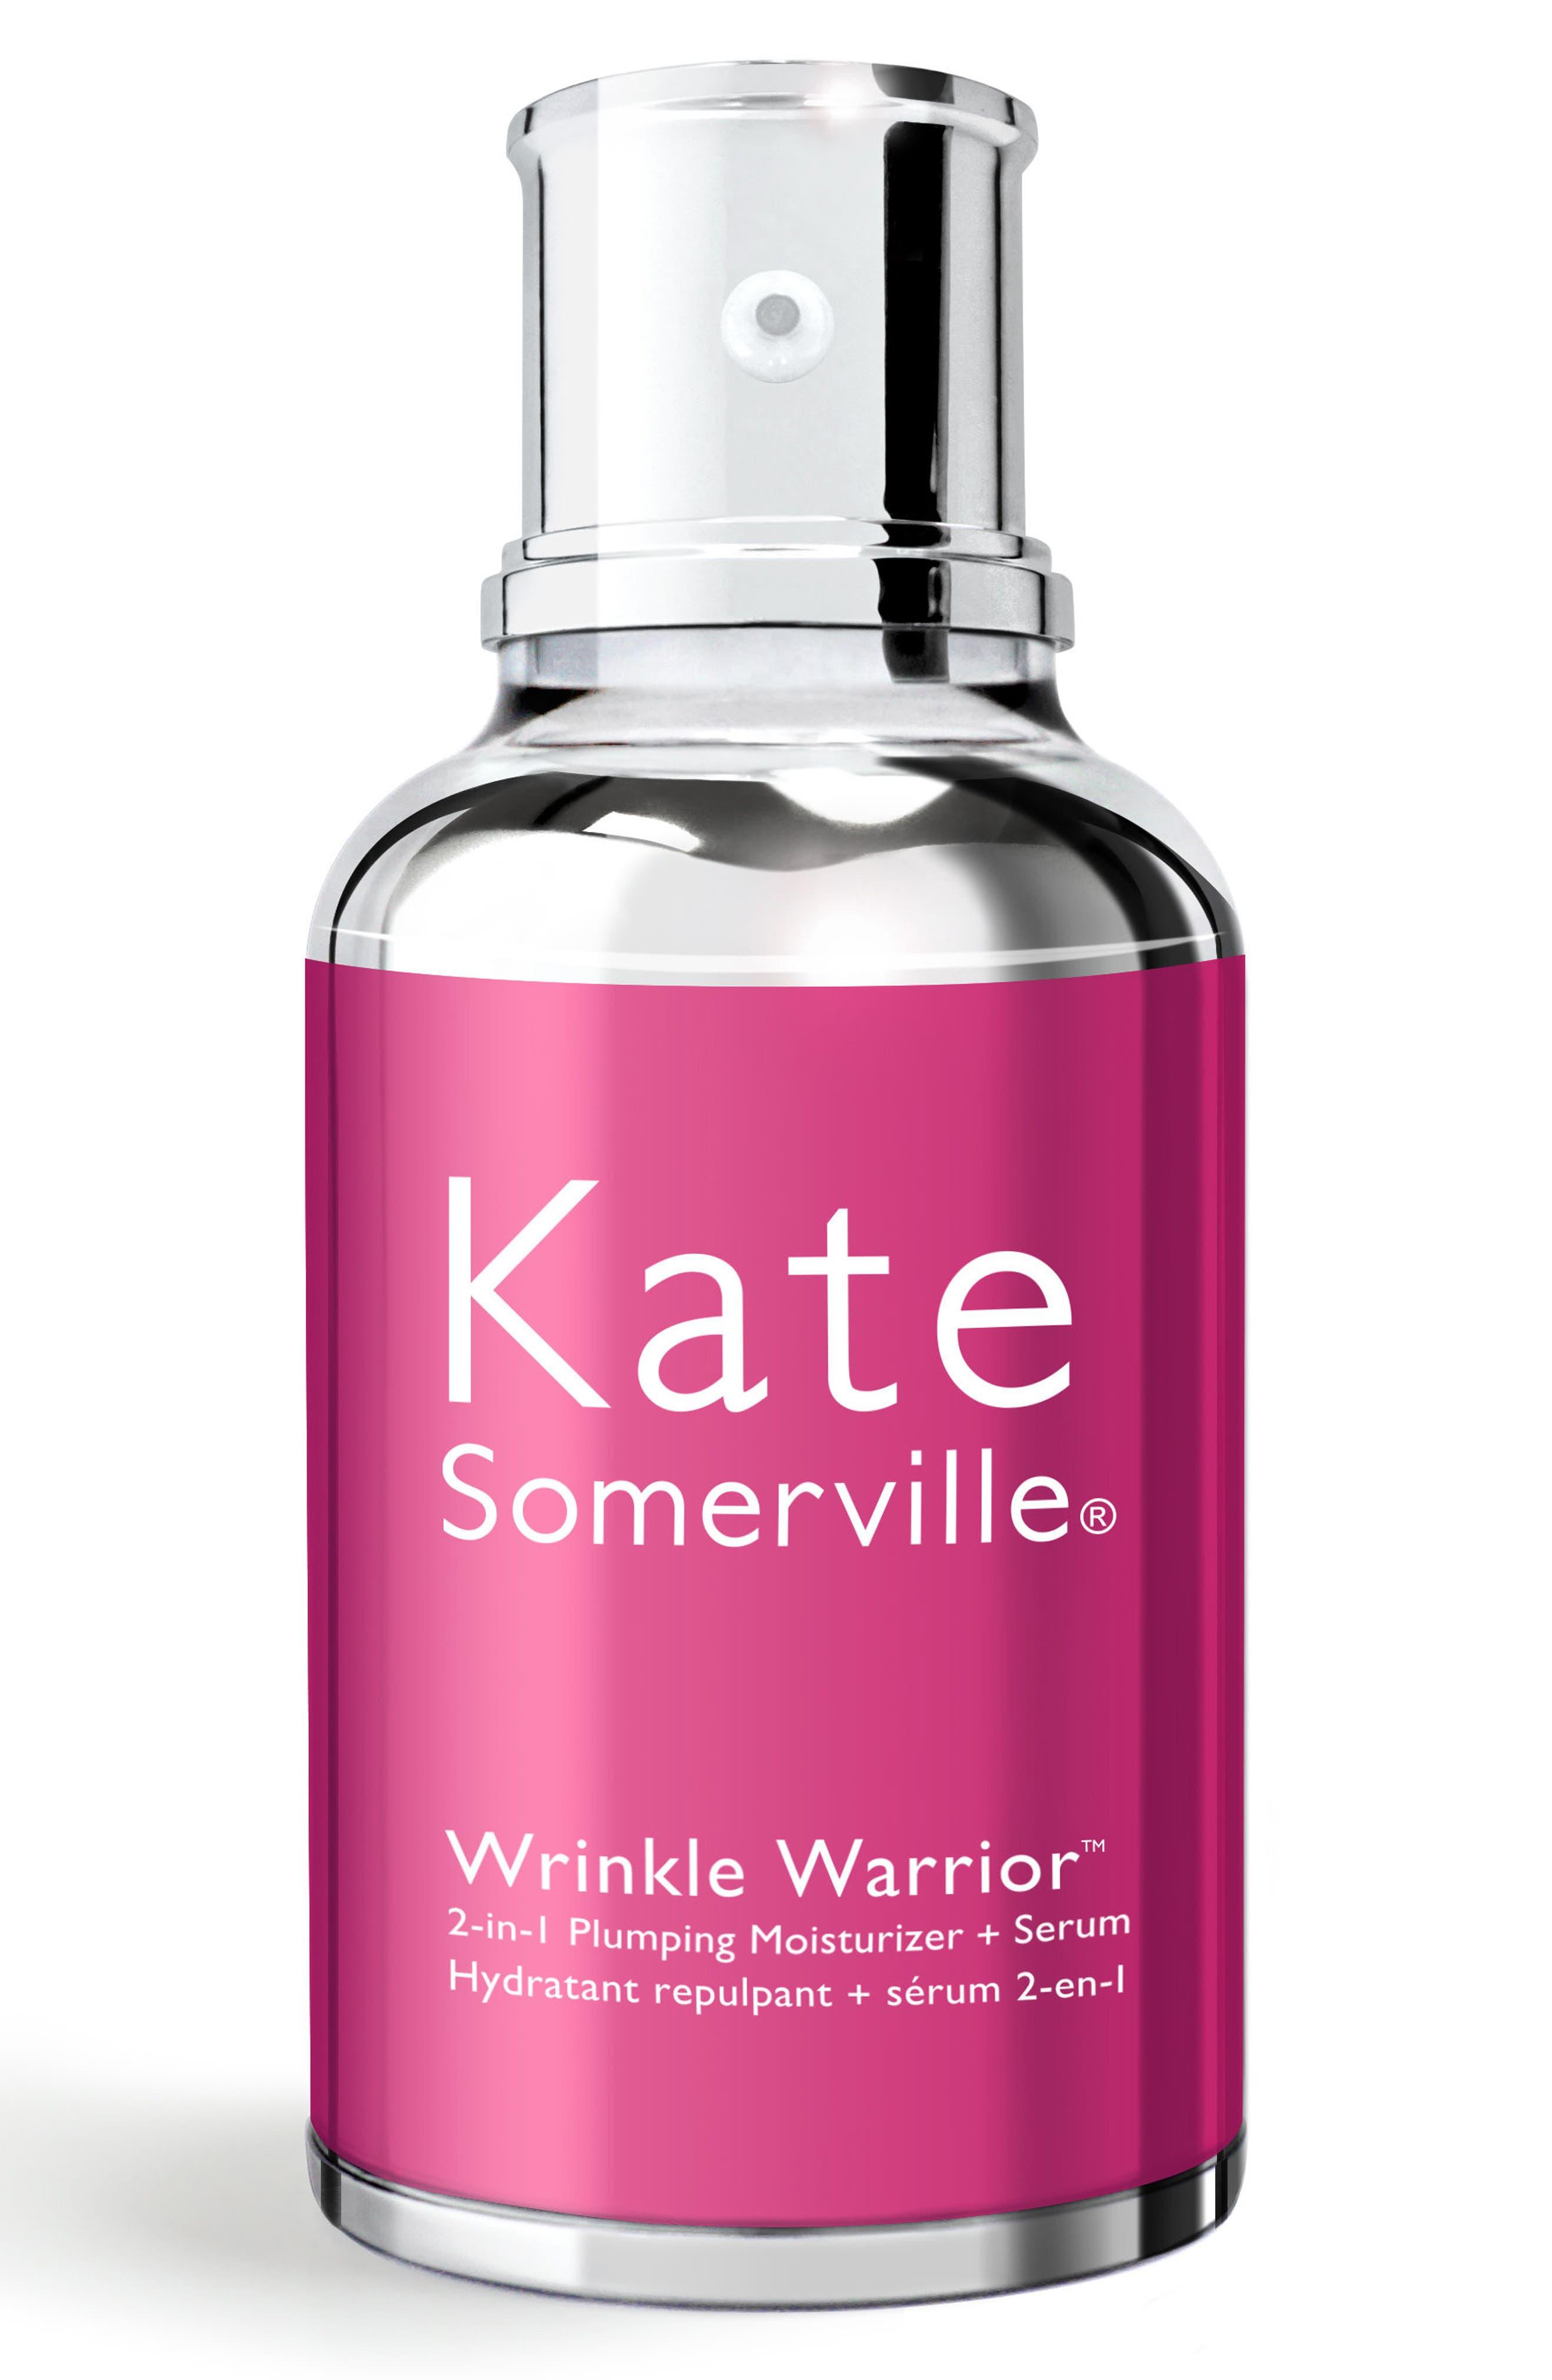 Kate Somerville® Wrinkle Warrior™ 2-in-1 Plumping Moisturizer + Serum